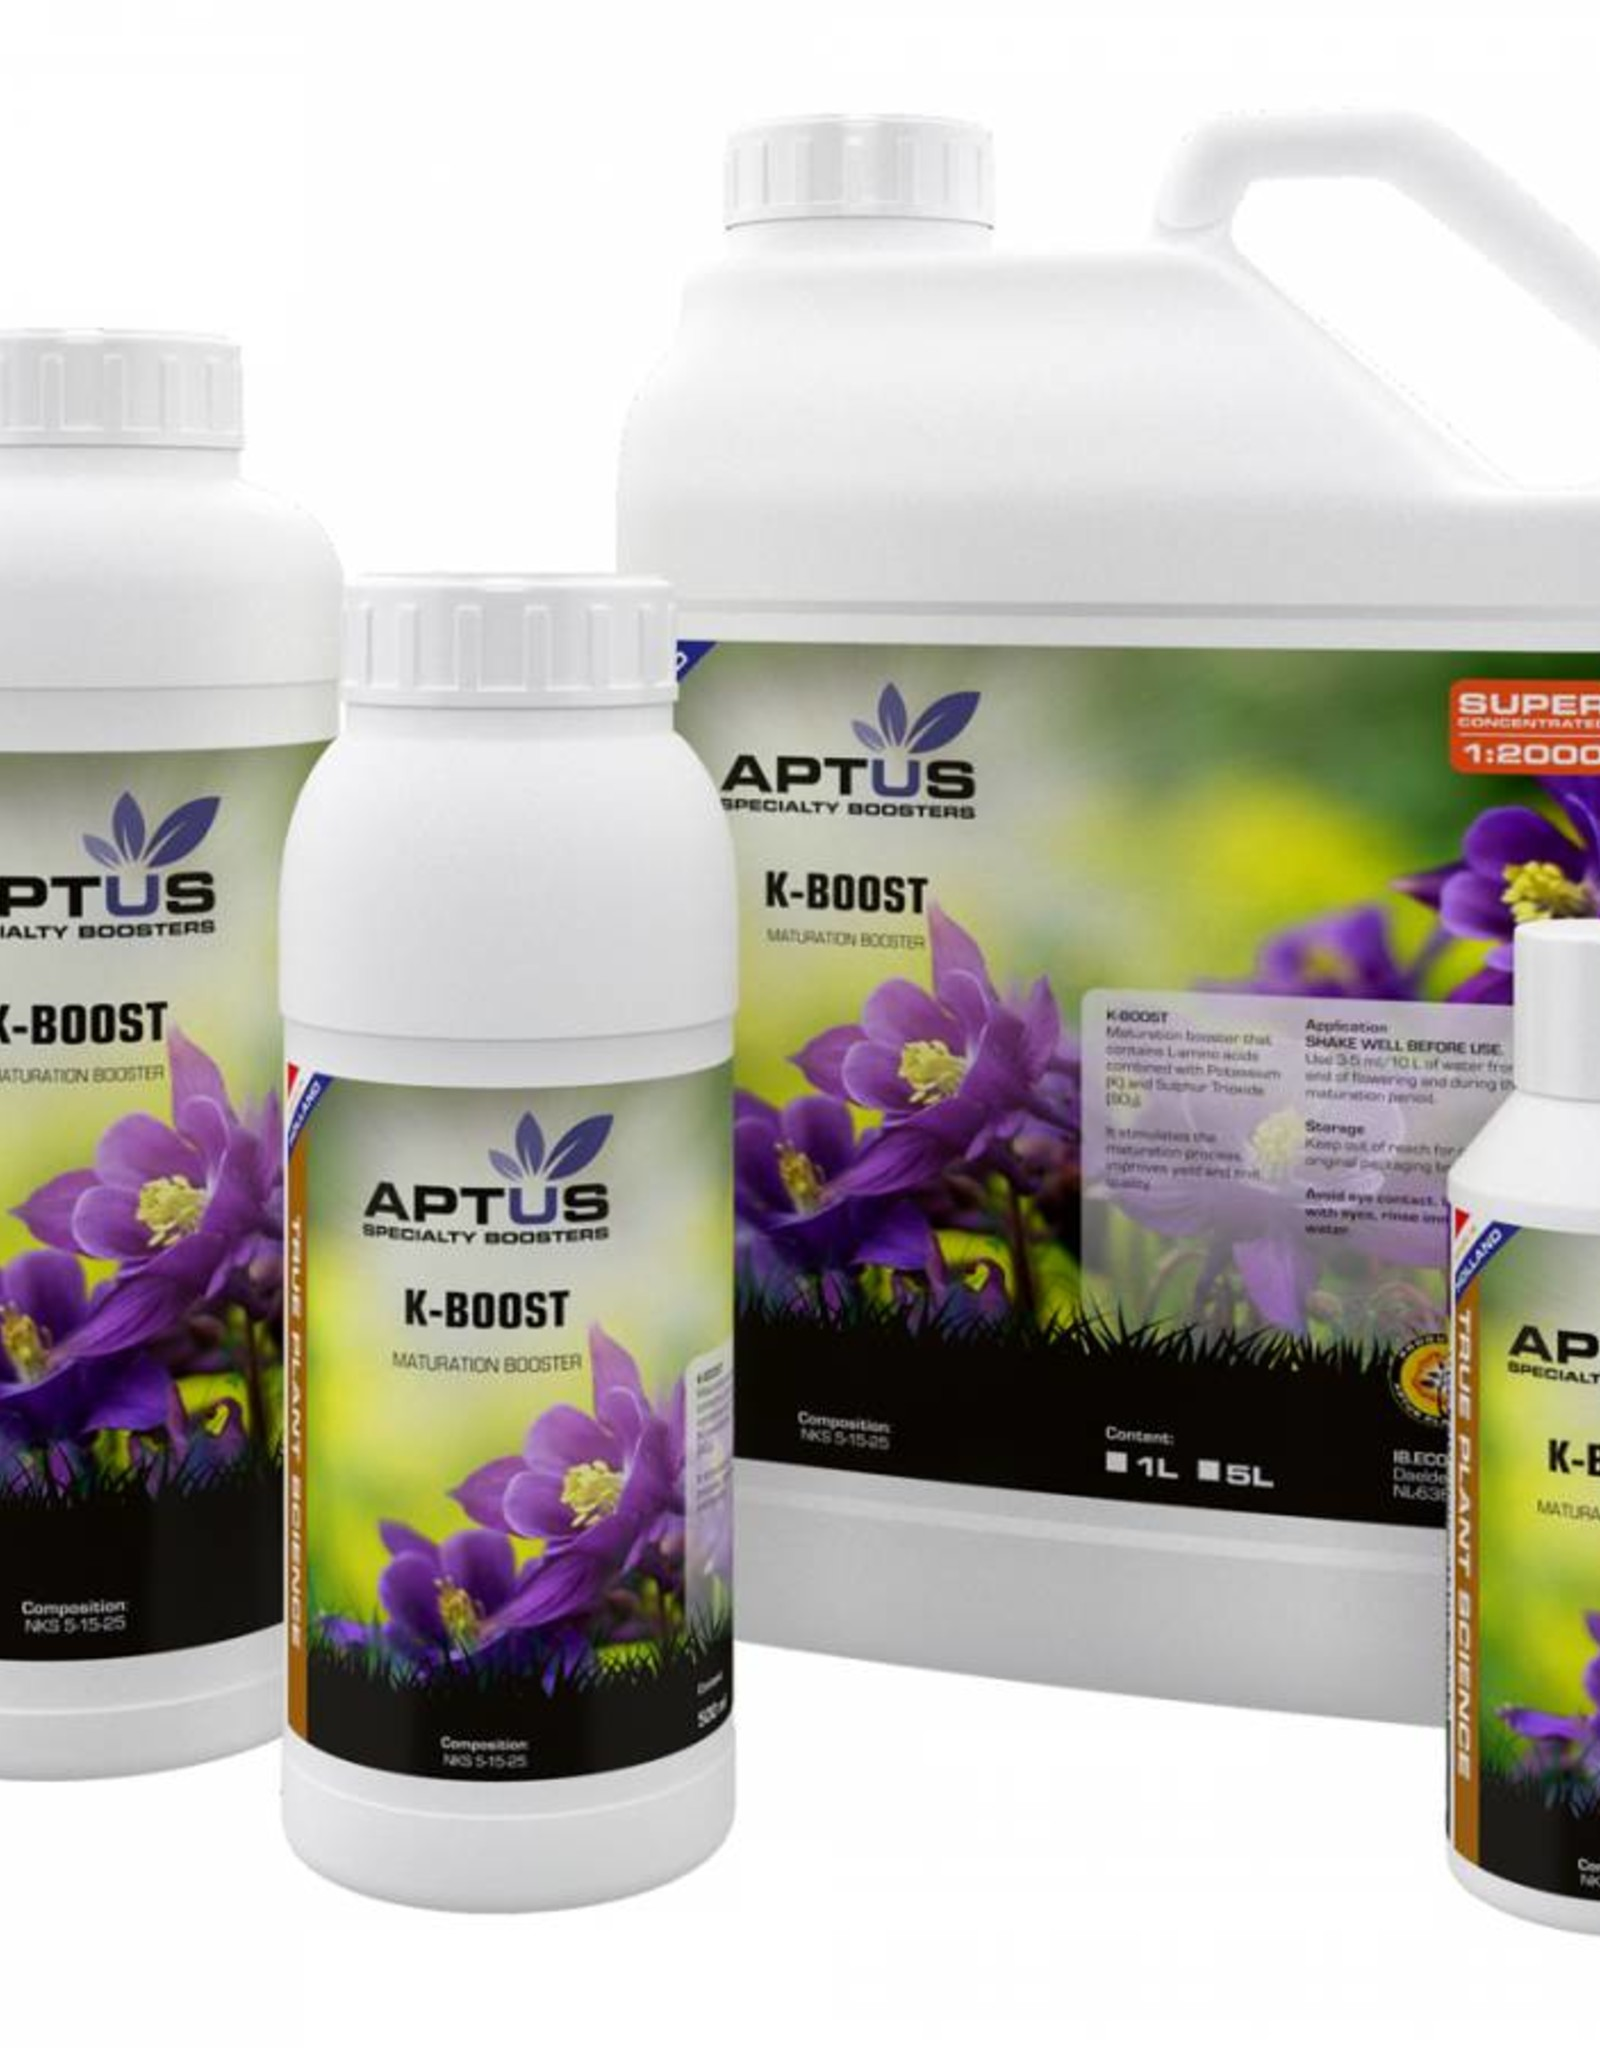 Aptus Aptus K-Boost